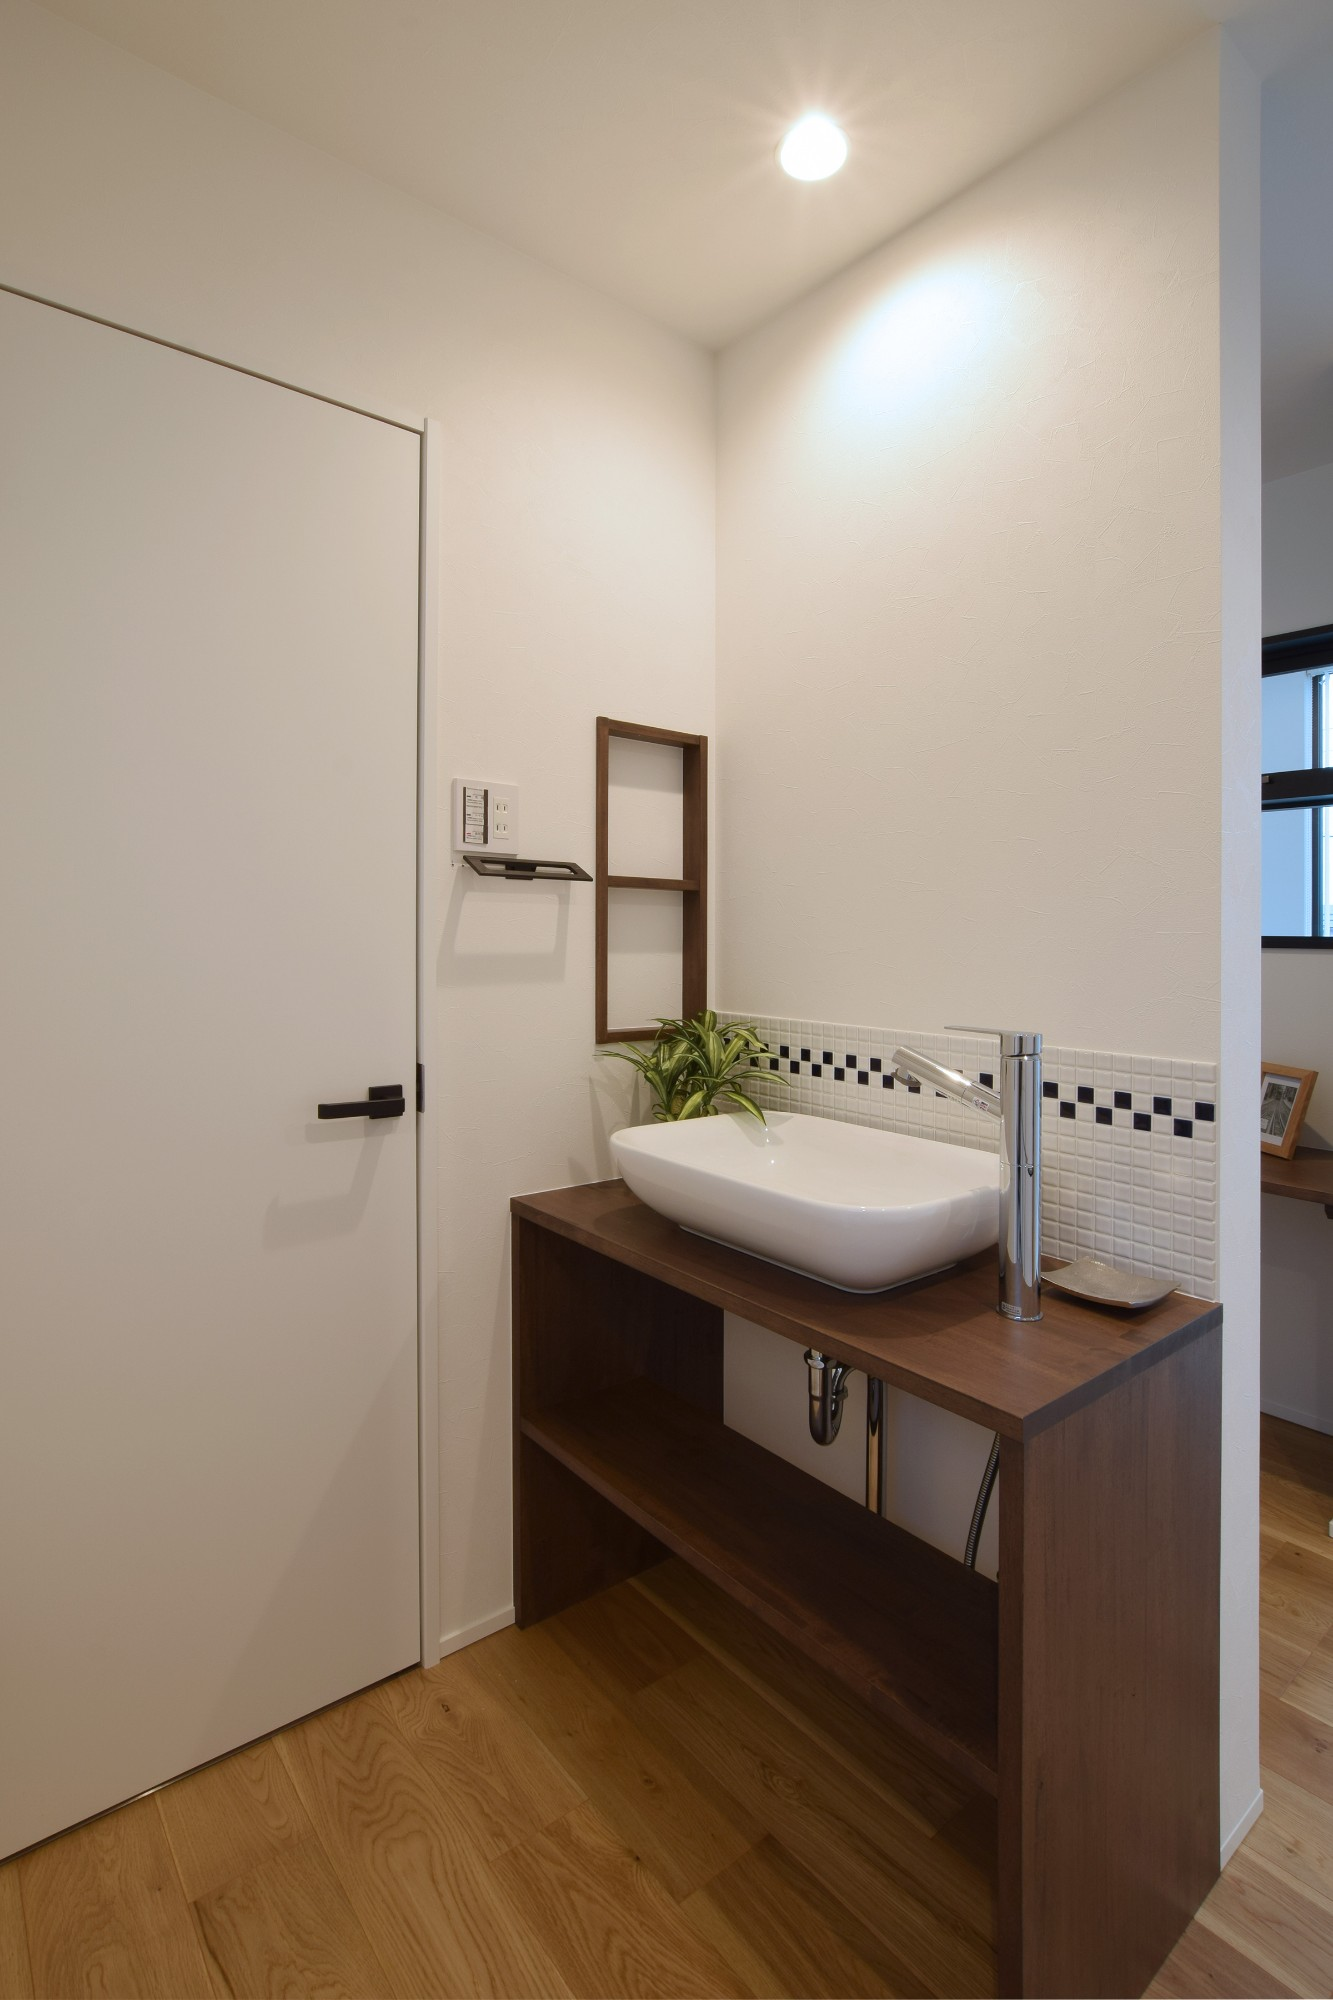 DETAIL HOME(ディテールホーム)「内と外がつながる吹抜け大開口の住まい」のヴィンテージな洗面所・脱衣所の実例写真